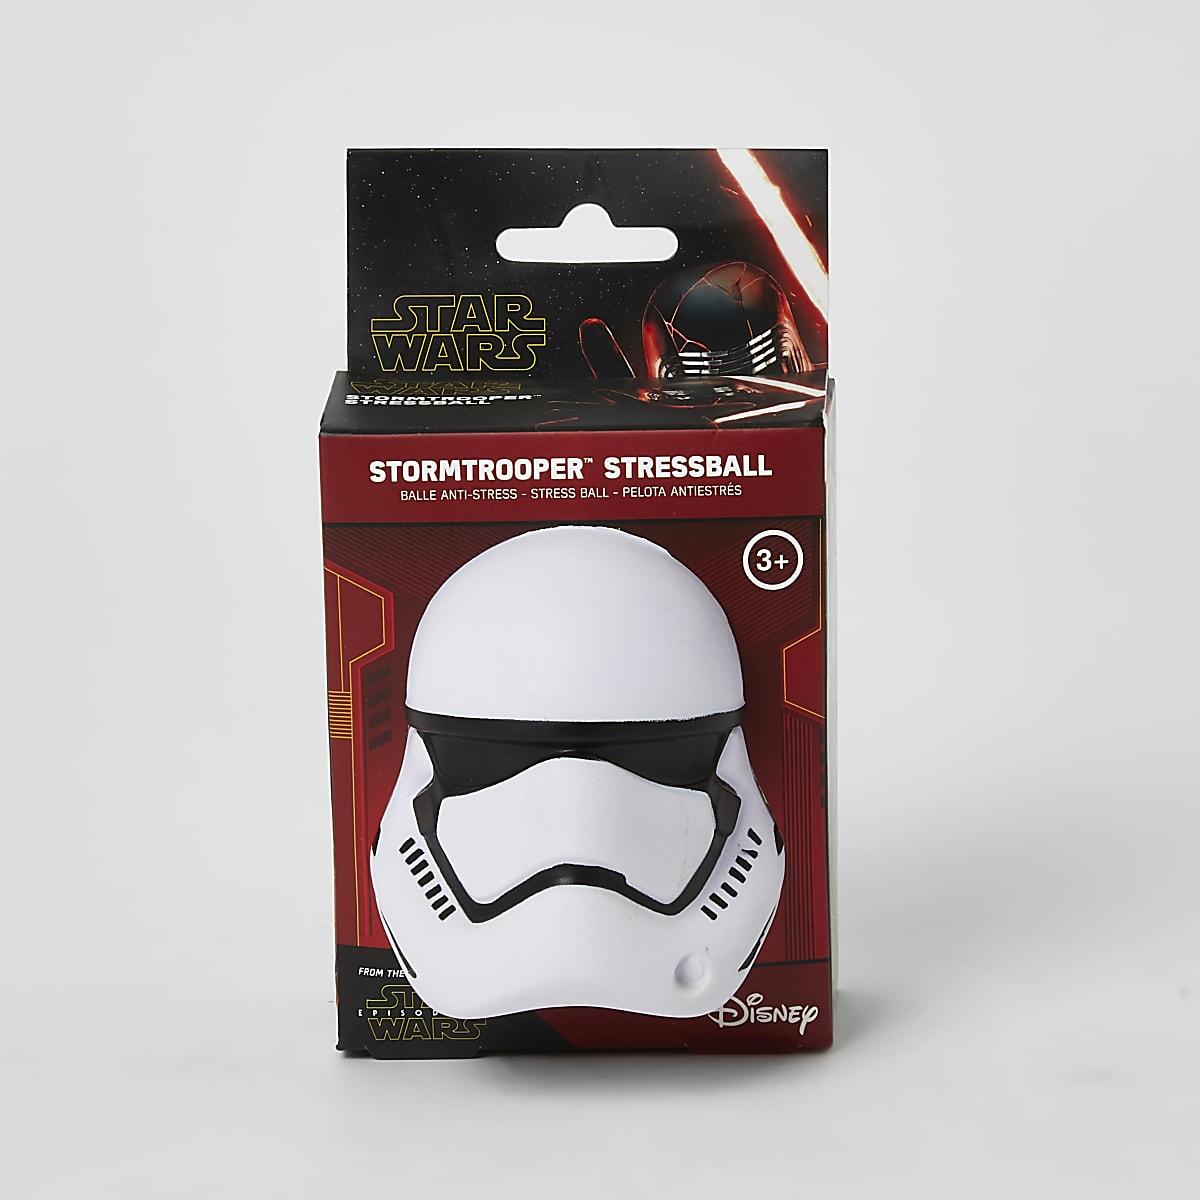 Star Wars white stormtrooper stressball